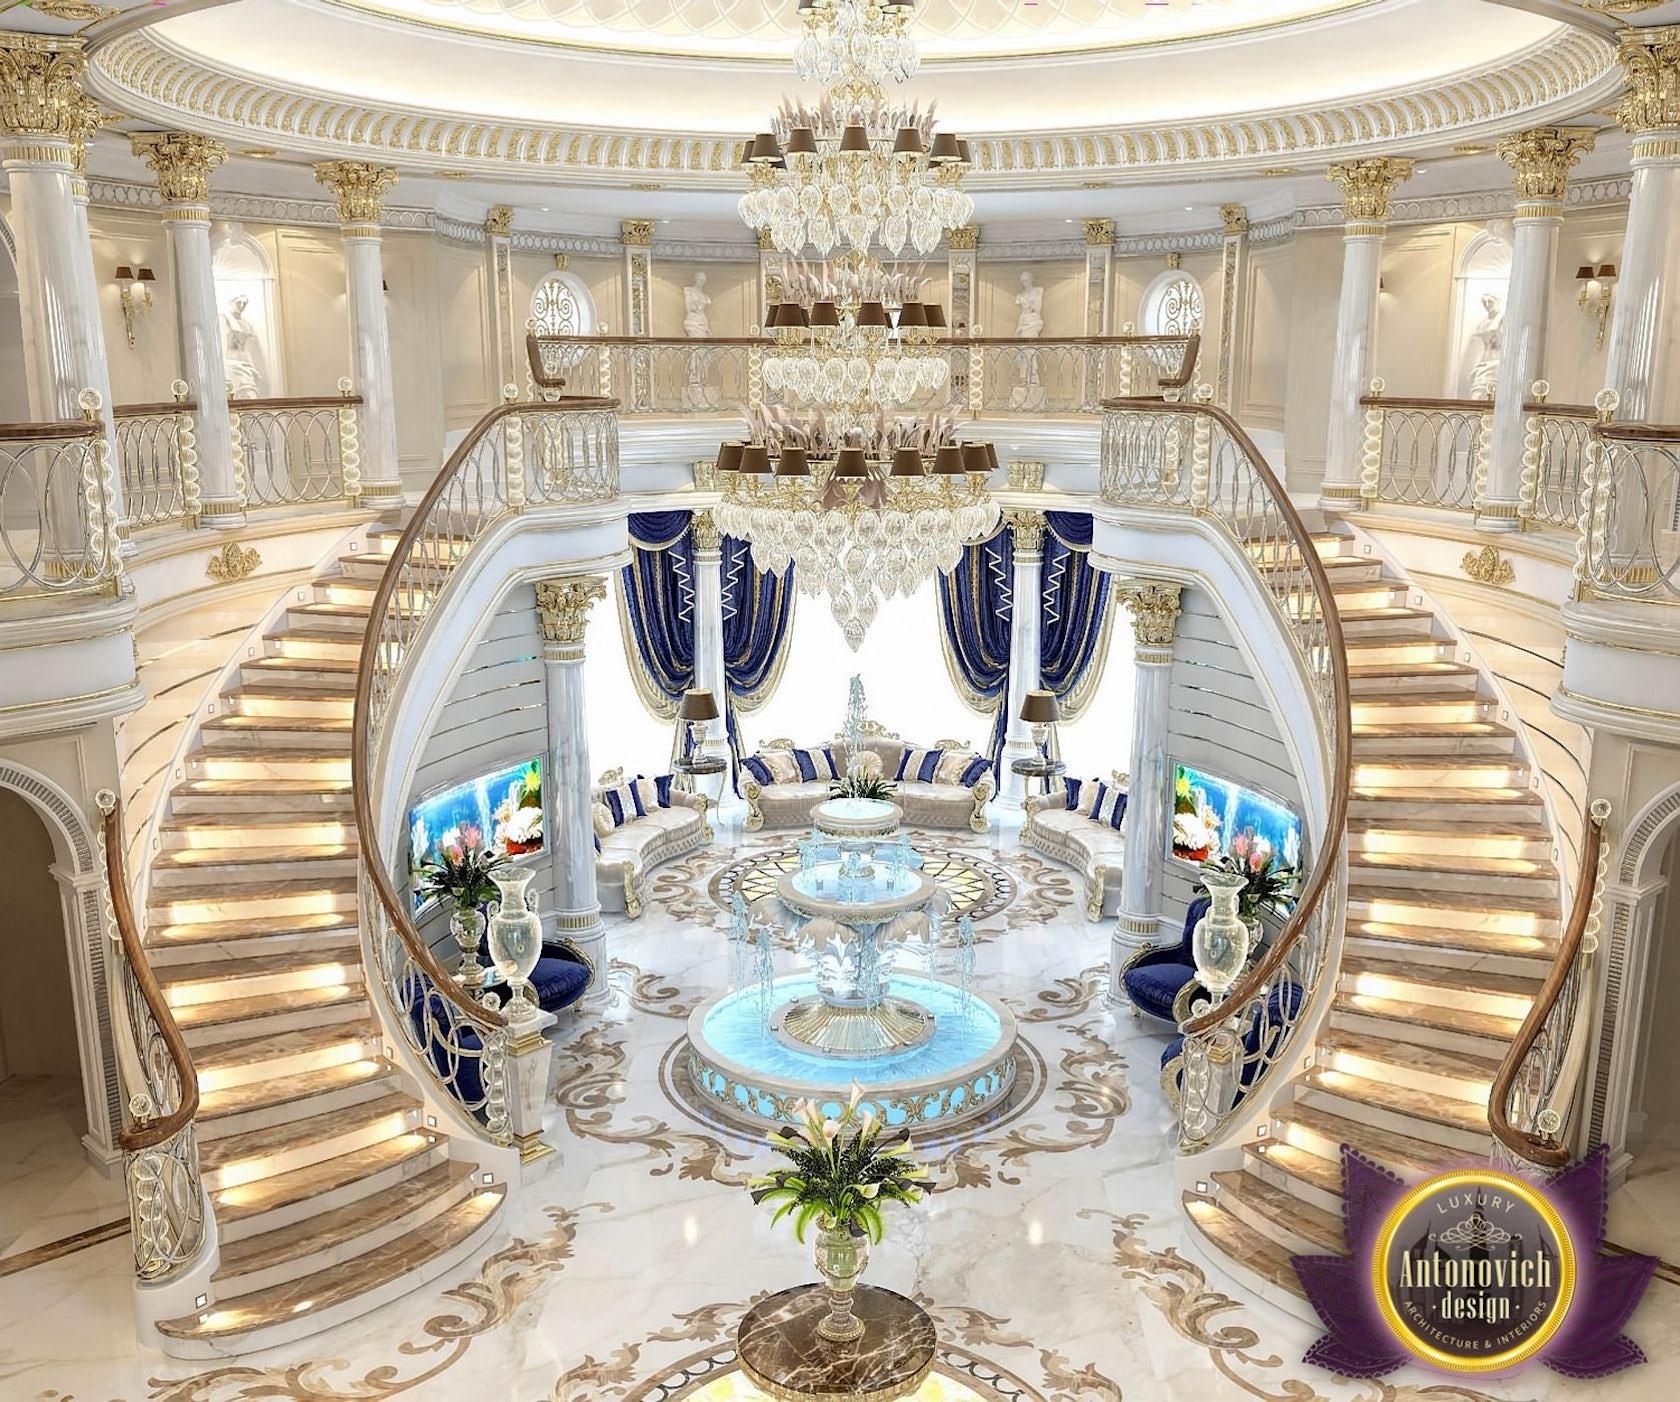 Katrina Antonovich Luxury Interior Design: The Best Interior Design In Saudi Arabia By Katrina